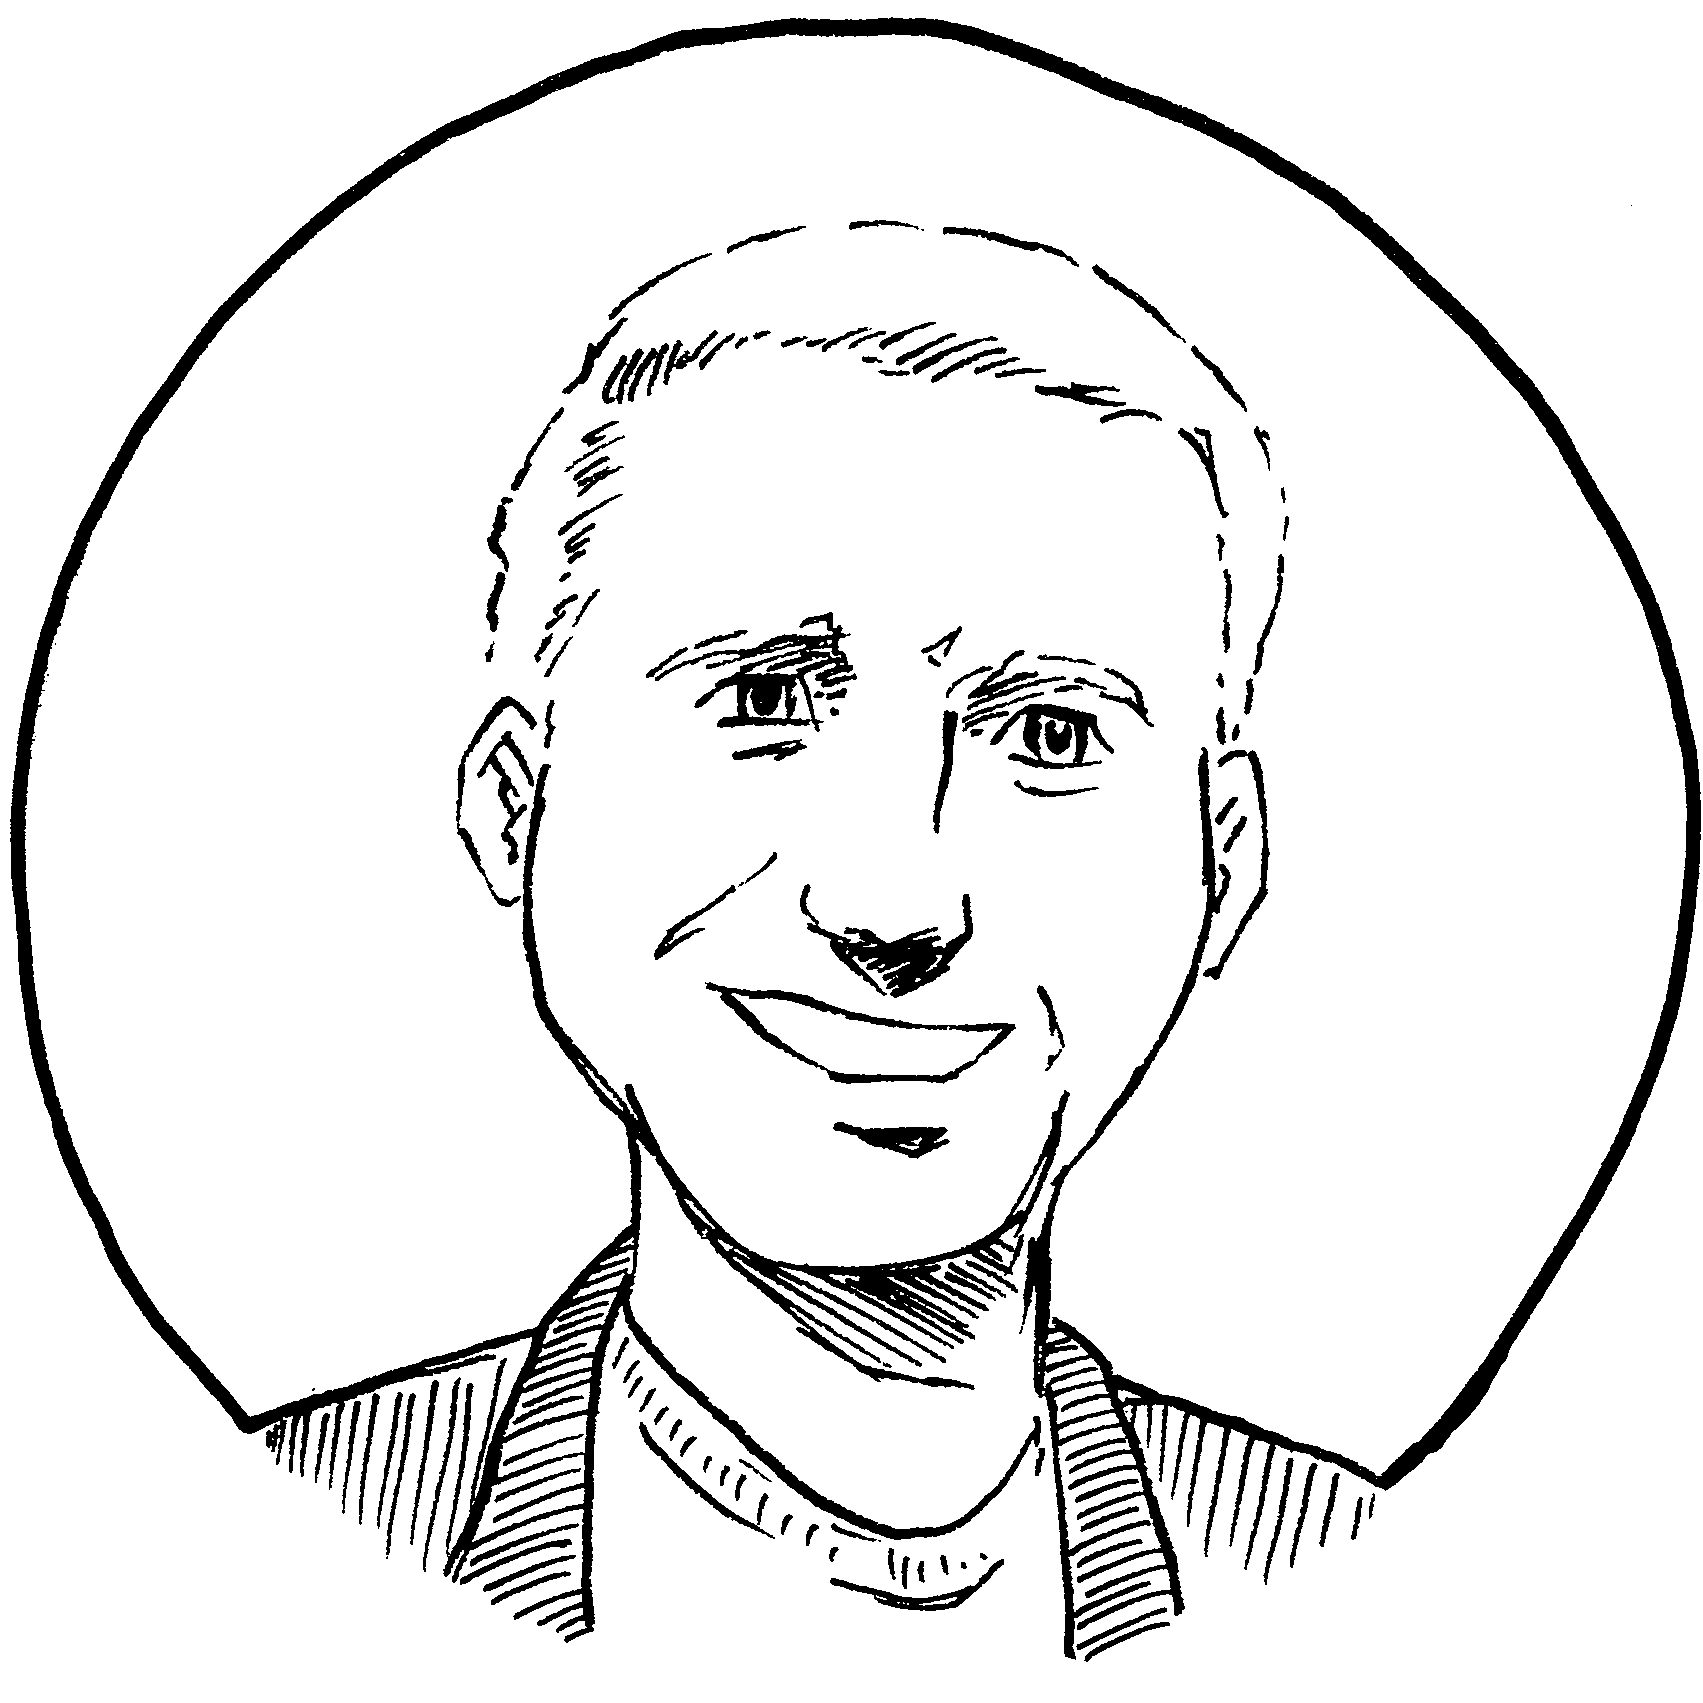 Josh Stumpenhorst